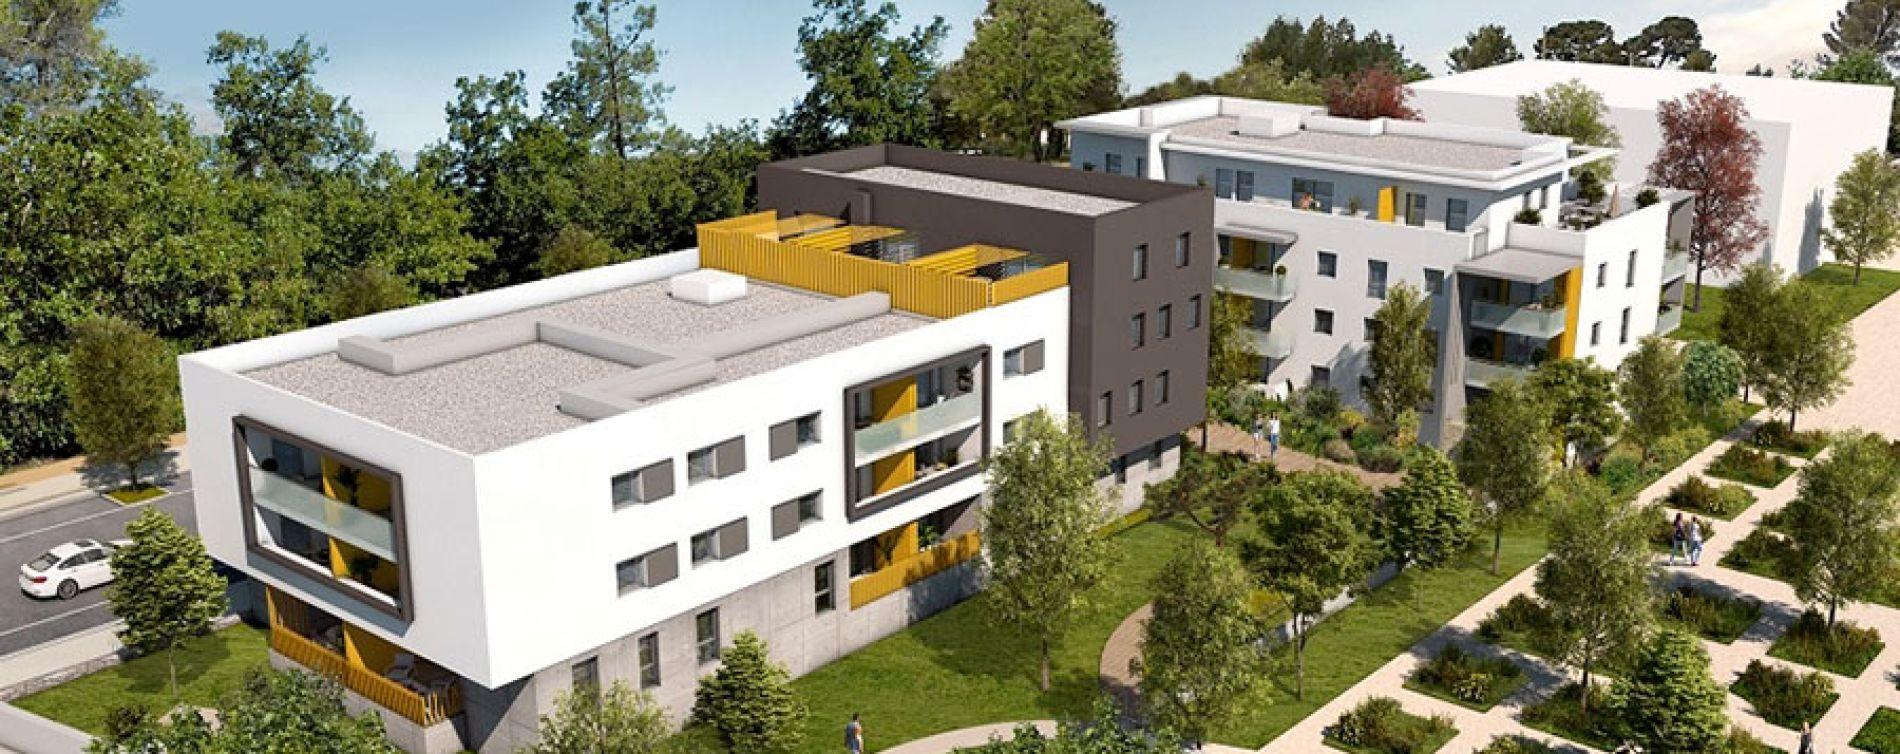 Résidence Cista Nova à Montpellier